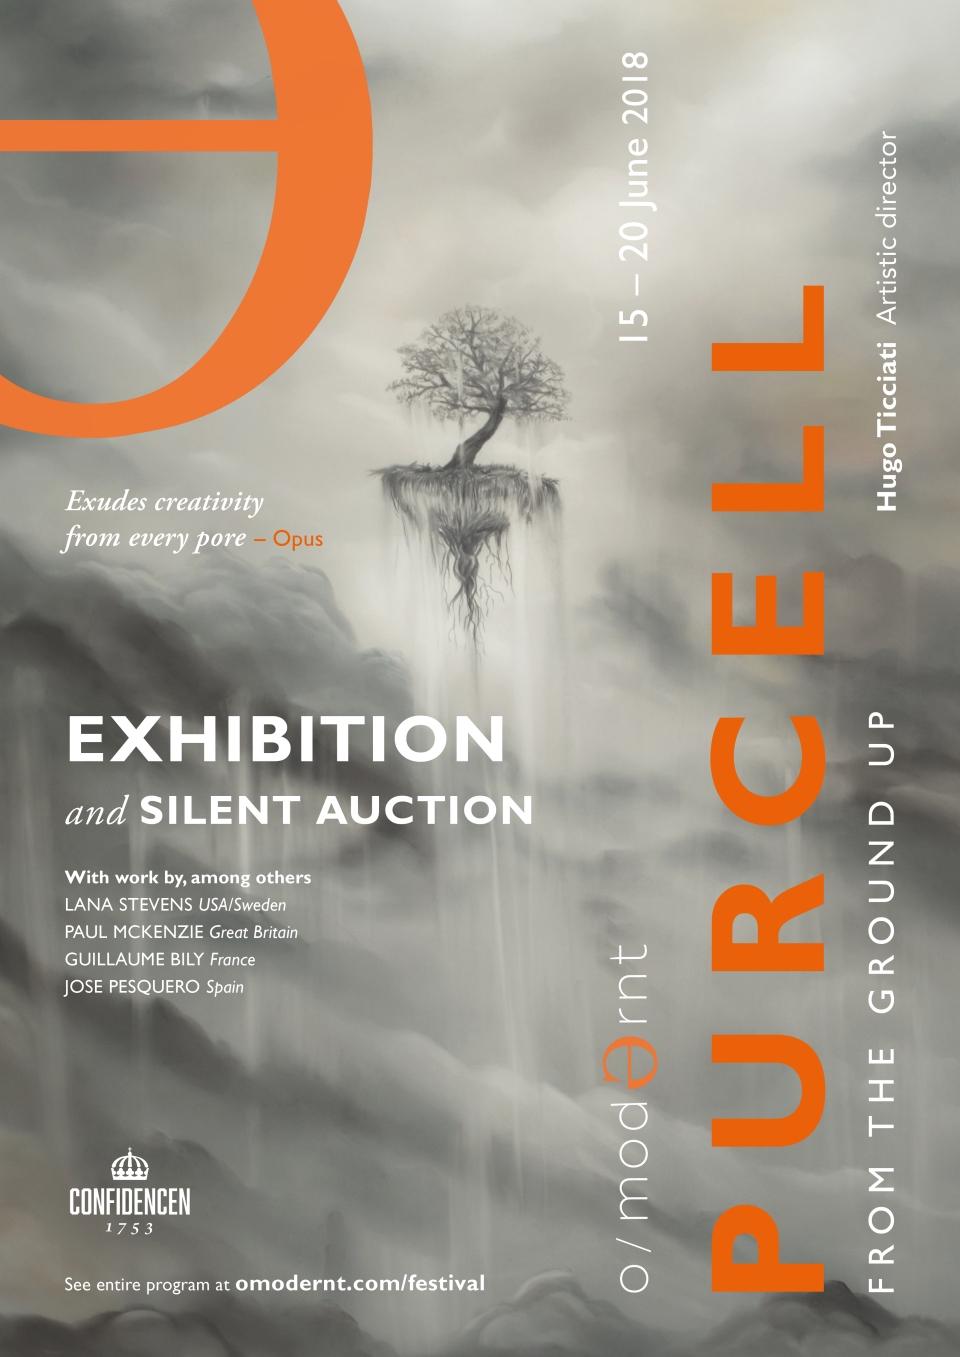 poster_OMODERNT2018_mailchimp_exhibition_eng2